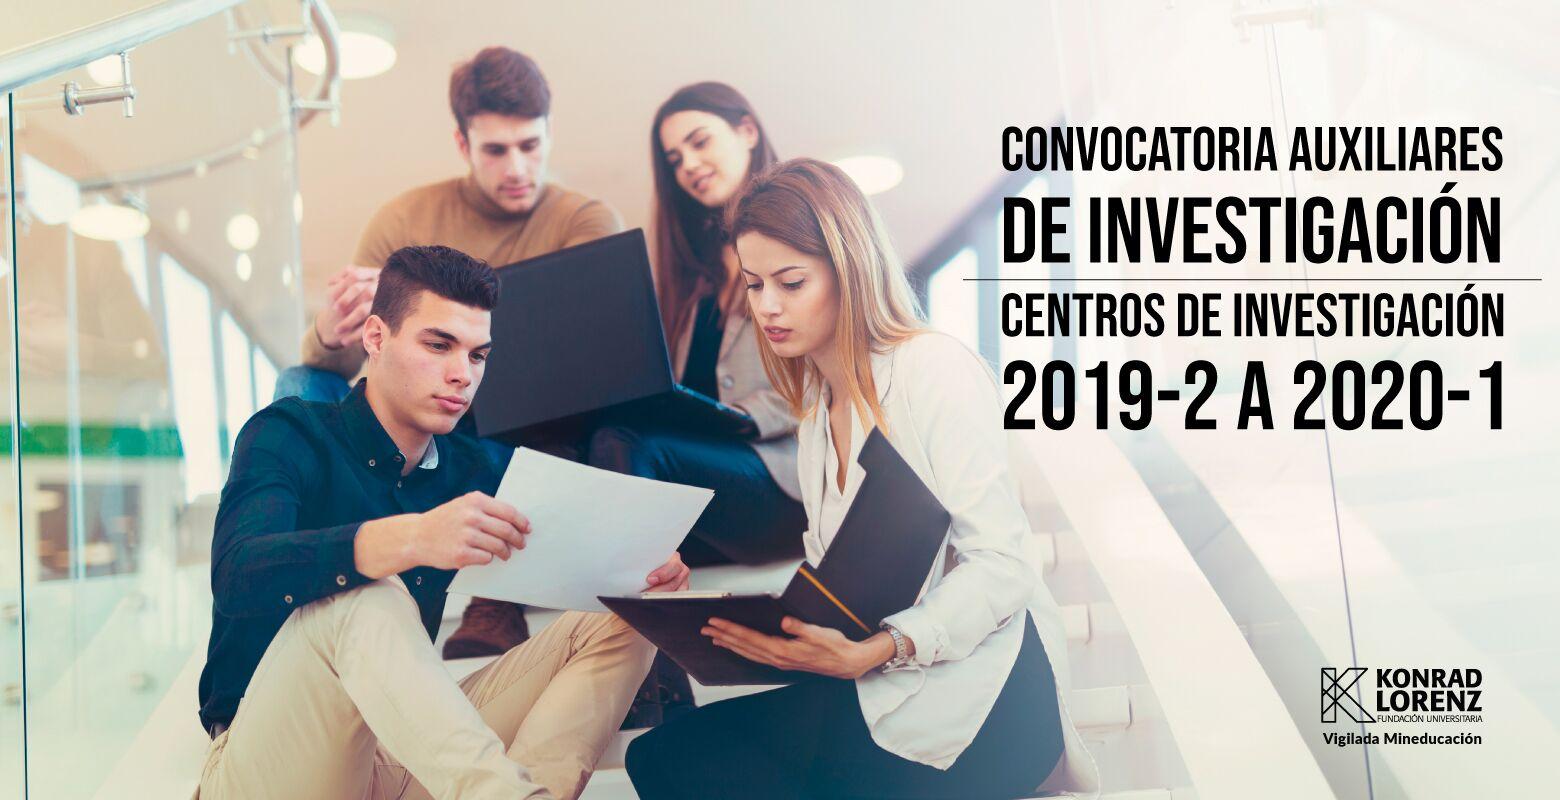 CONVOCATORIA INSTITUCIONAL AUXILIARES DE INVESTIGACIÓN 2019-2 / 2020-1